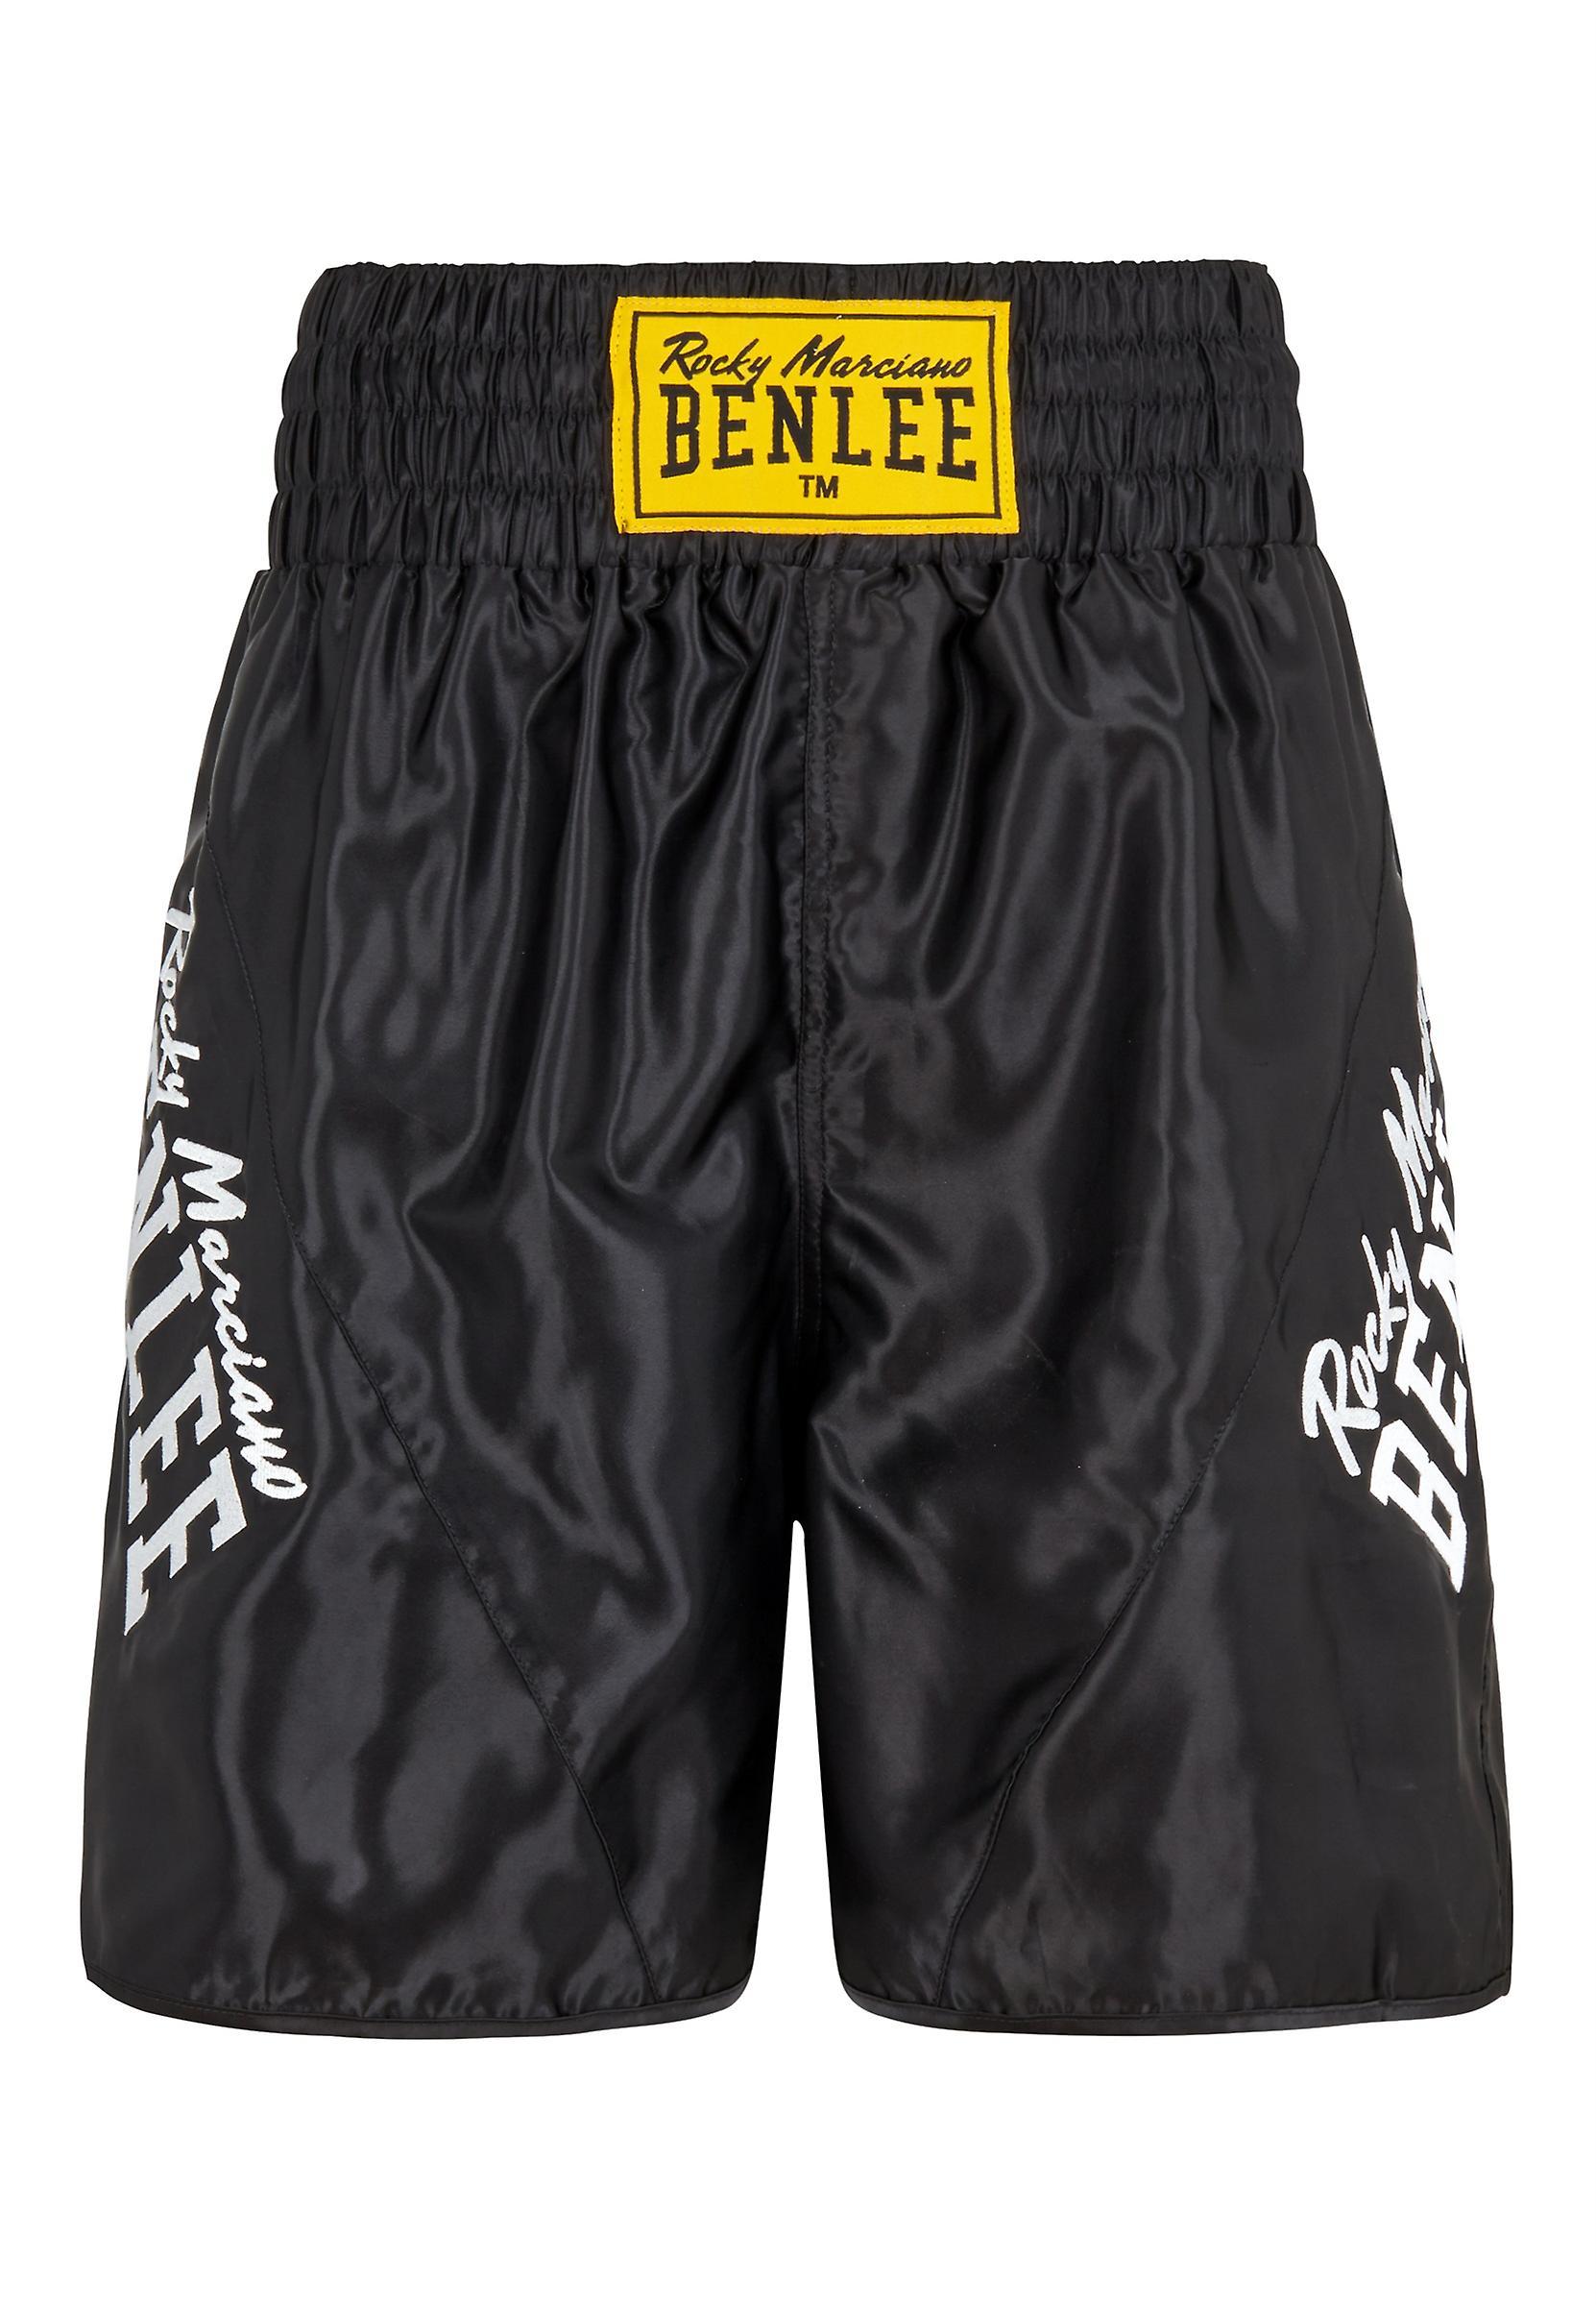 Shorts de boxe masculine William Bonaventure